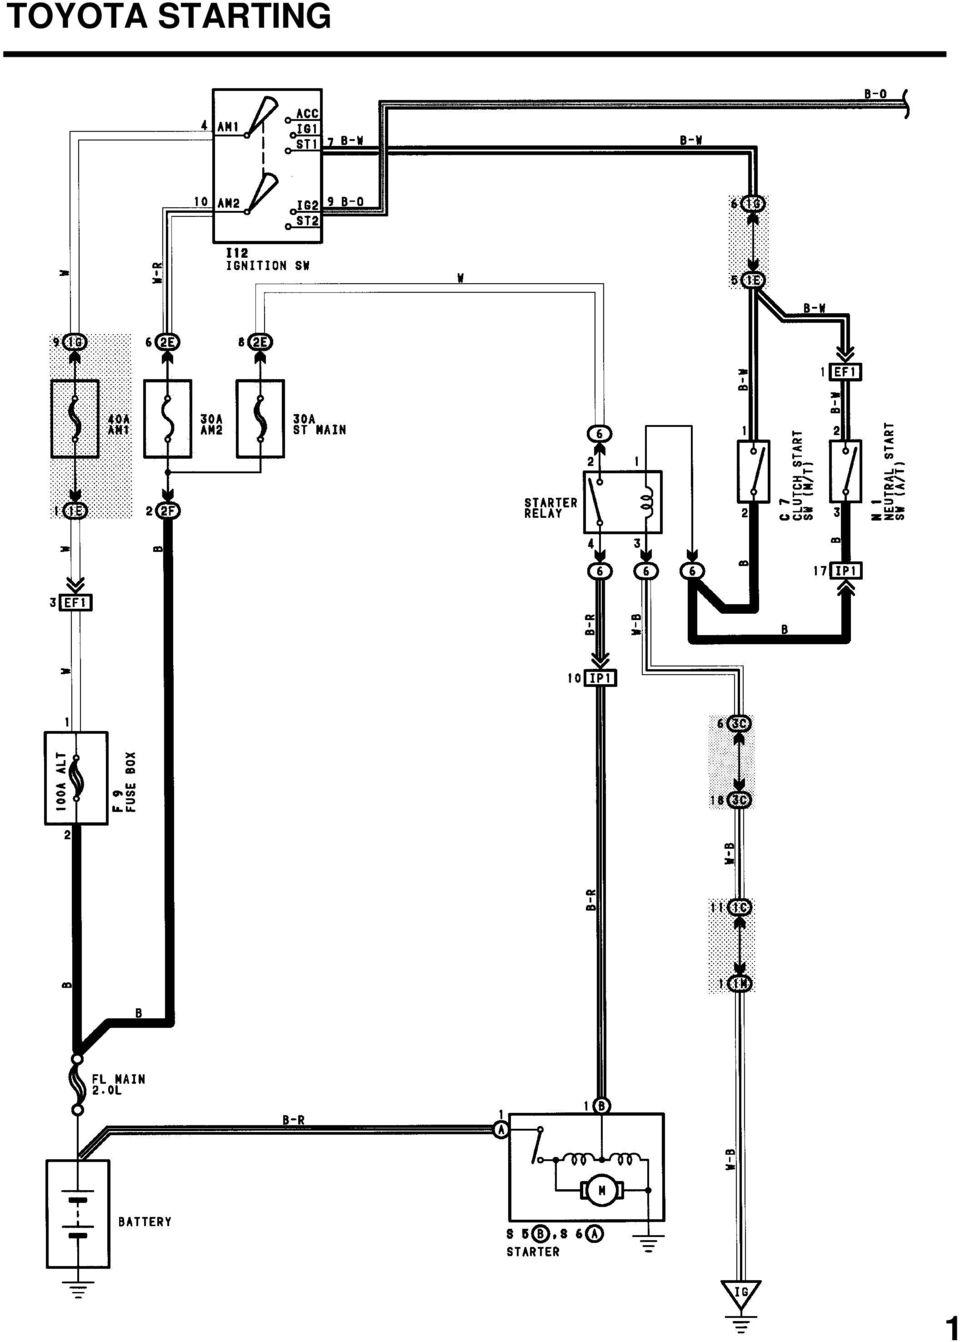 Toyota aygo wiring diagram pdf